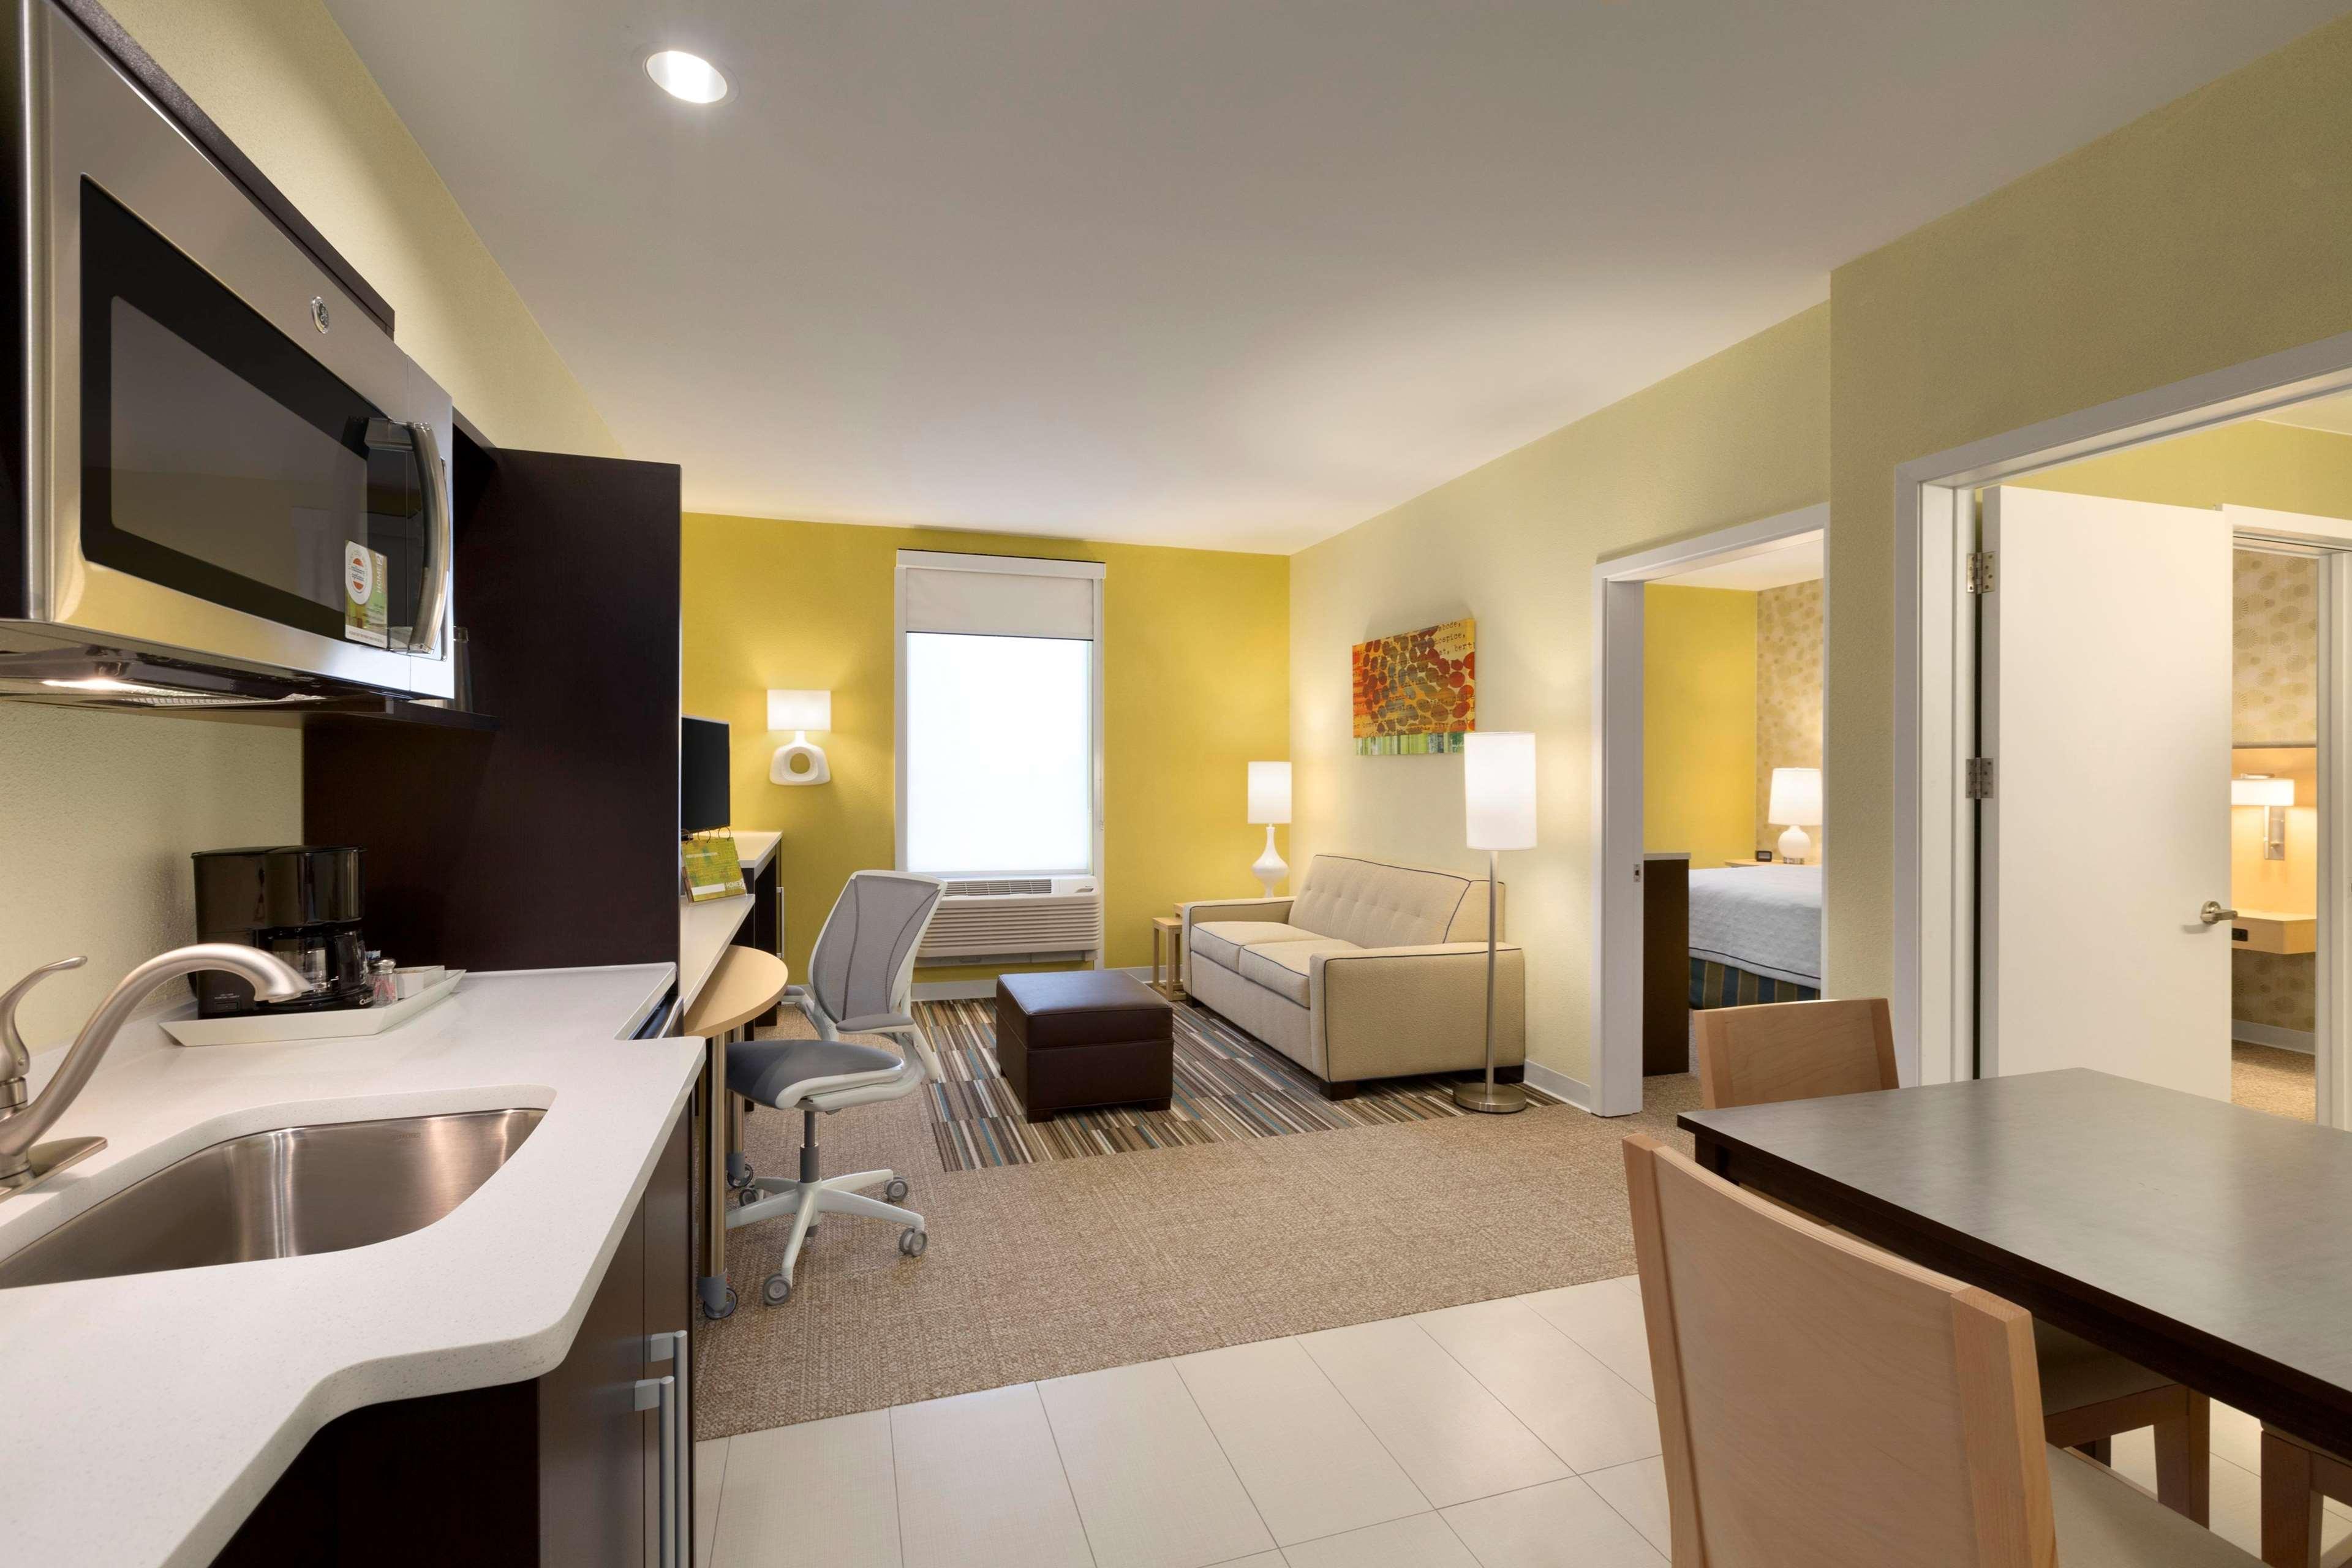 Home2 Suites by Hilton Houston Pasadena image 8